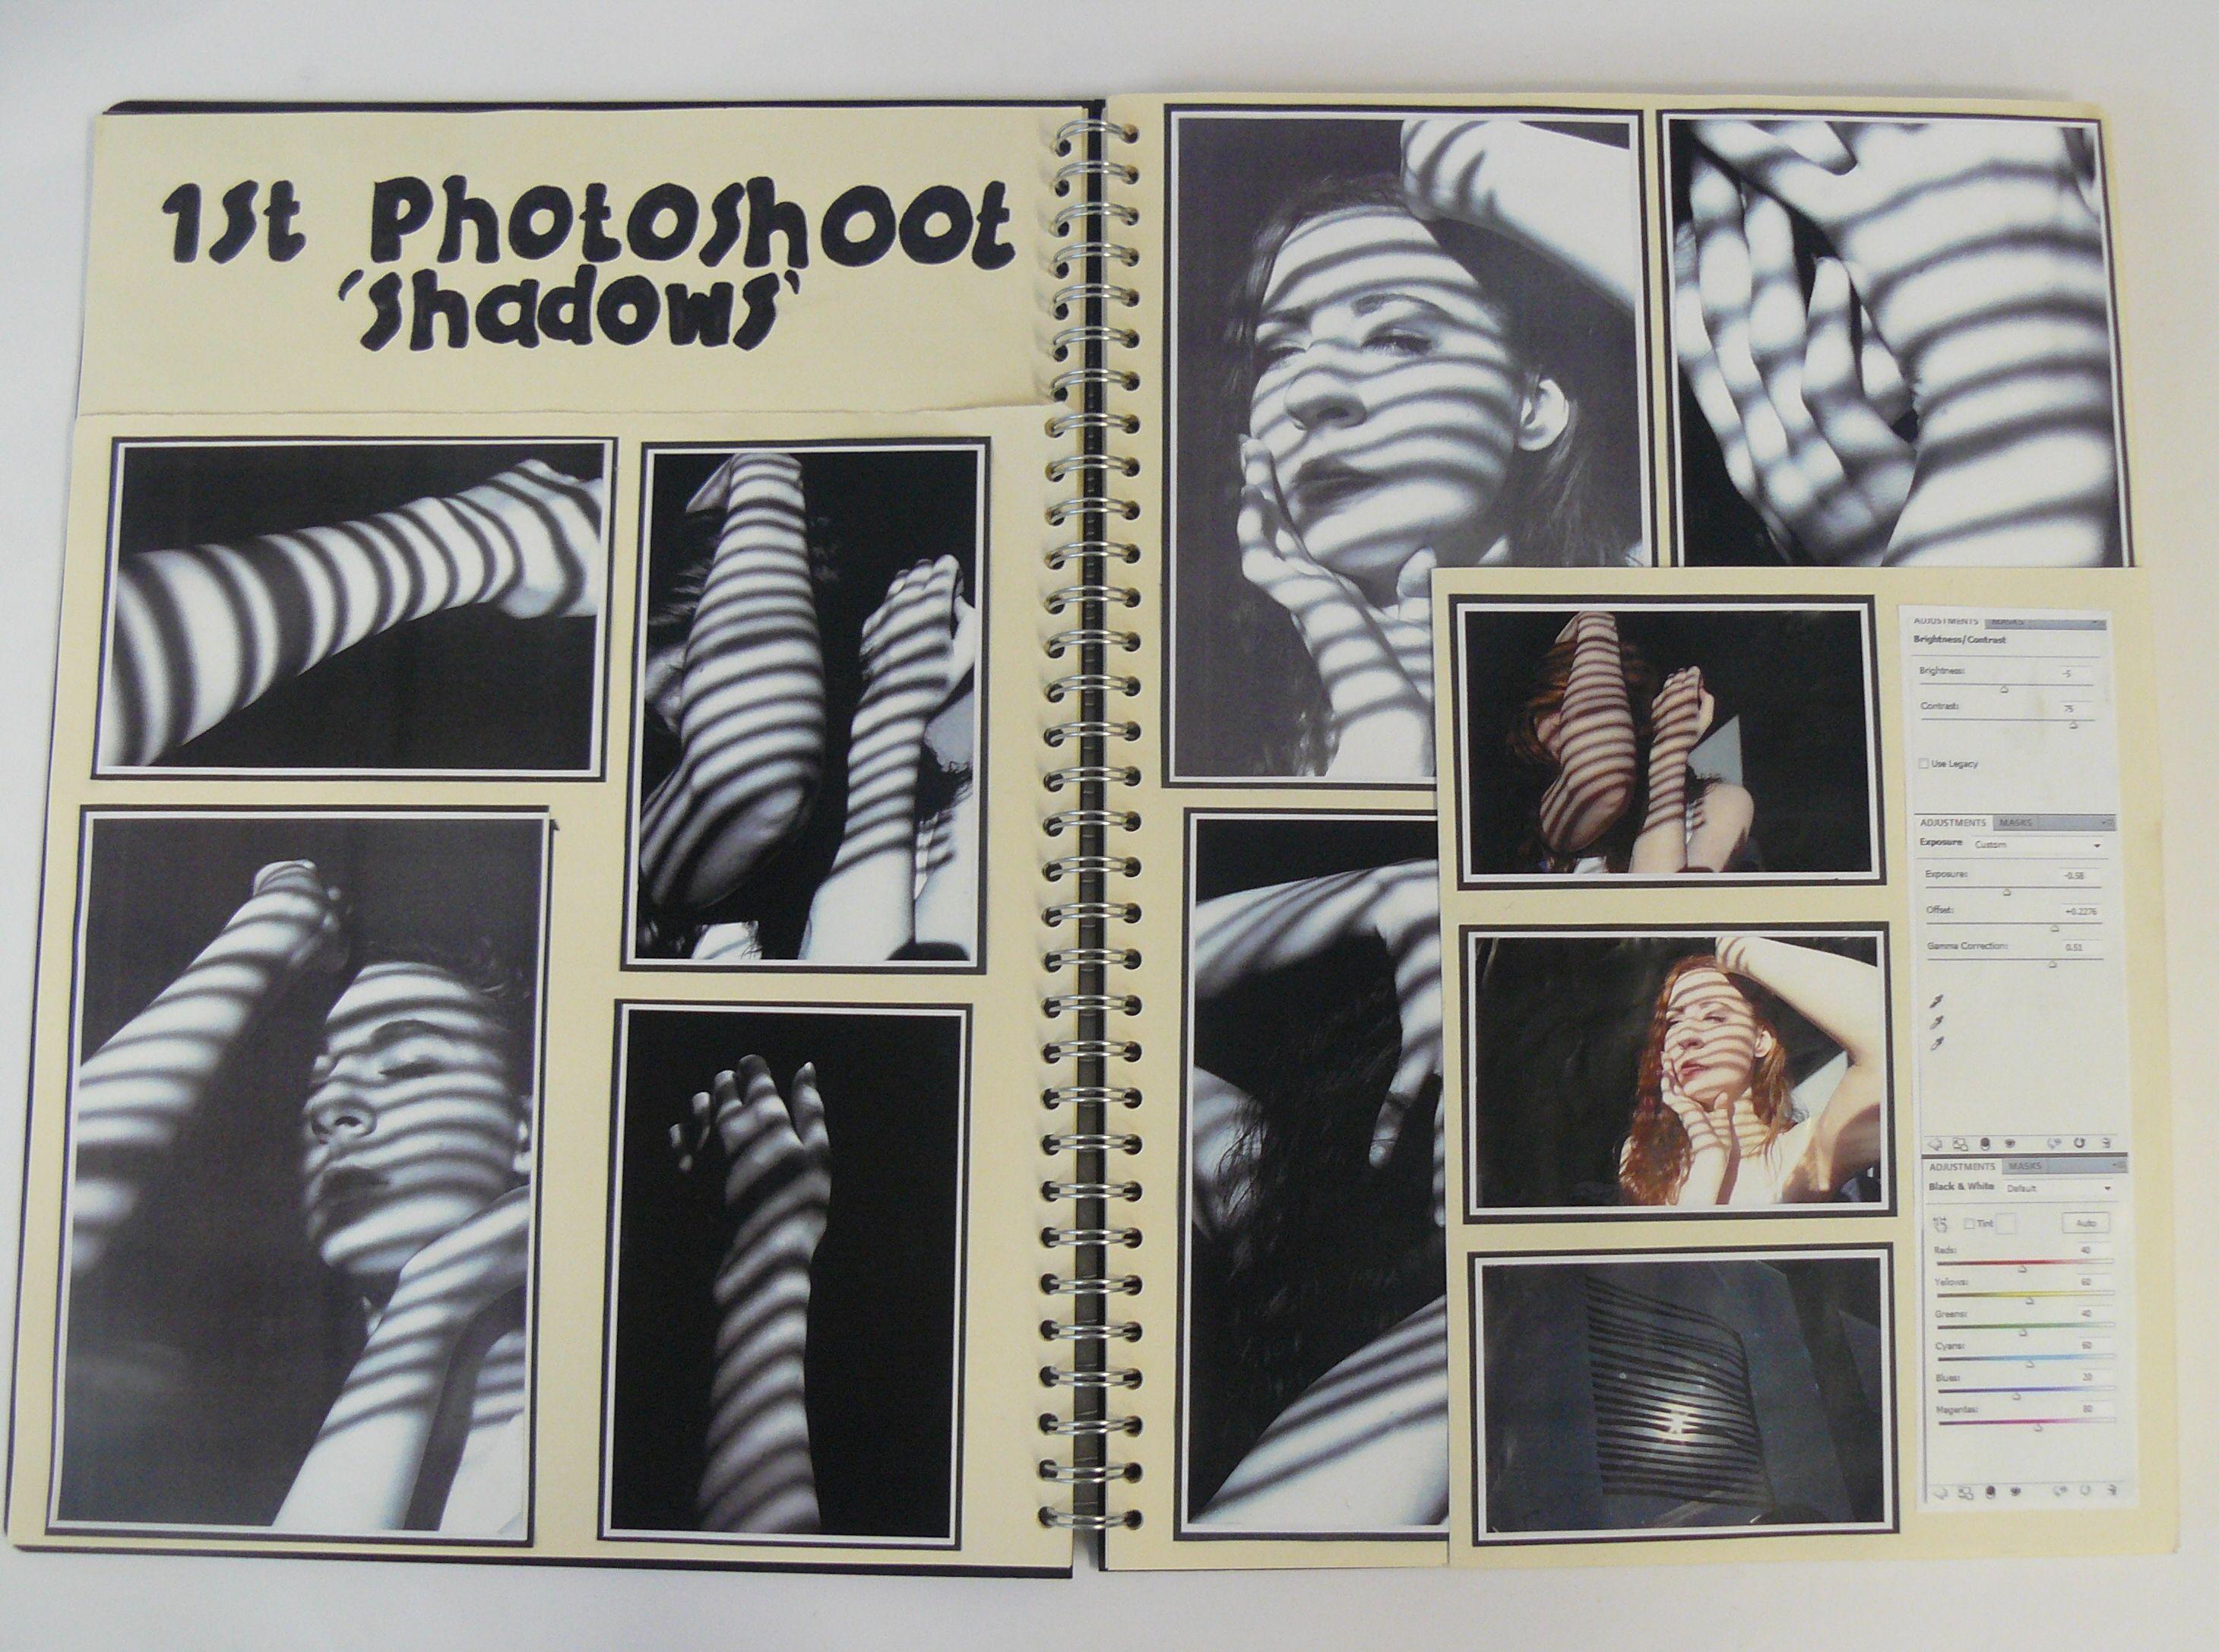 As Photography A3 Cream Sketchbook Photoshoot Esa Theme